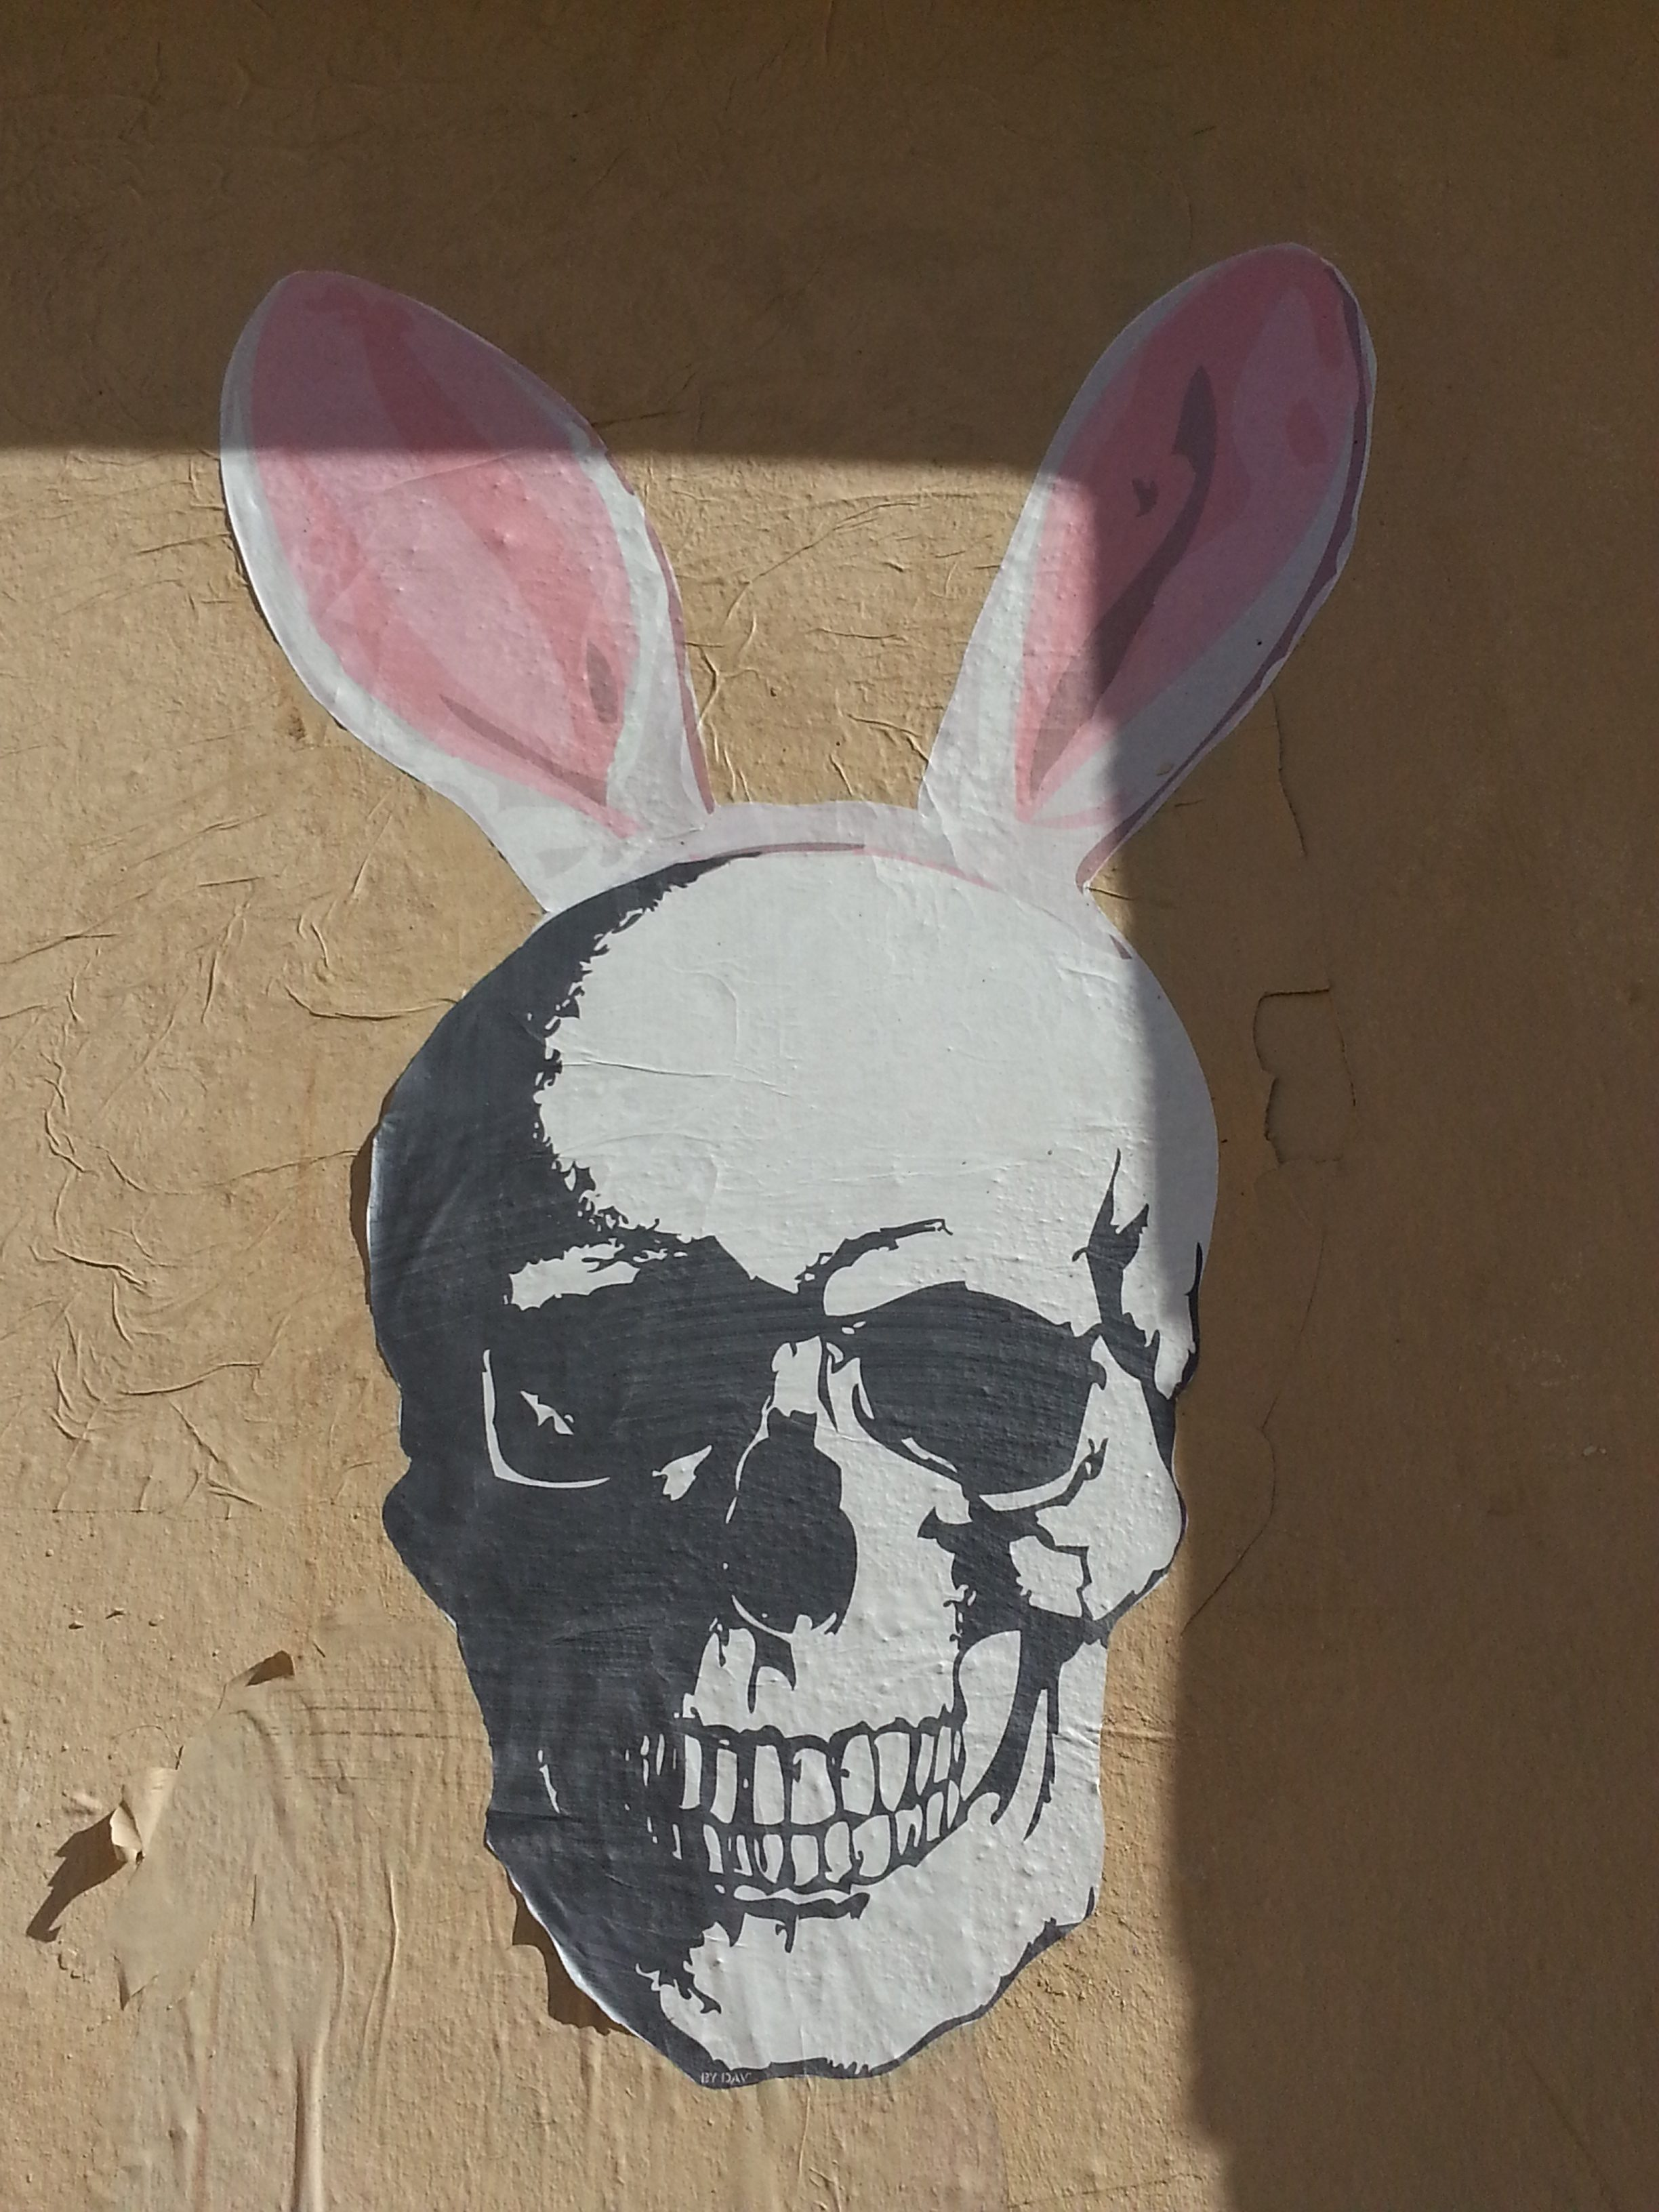 street art pentes croix rousse lyon 2